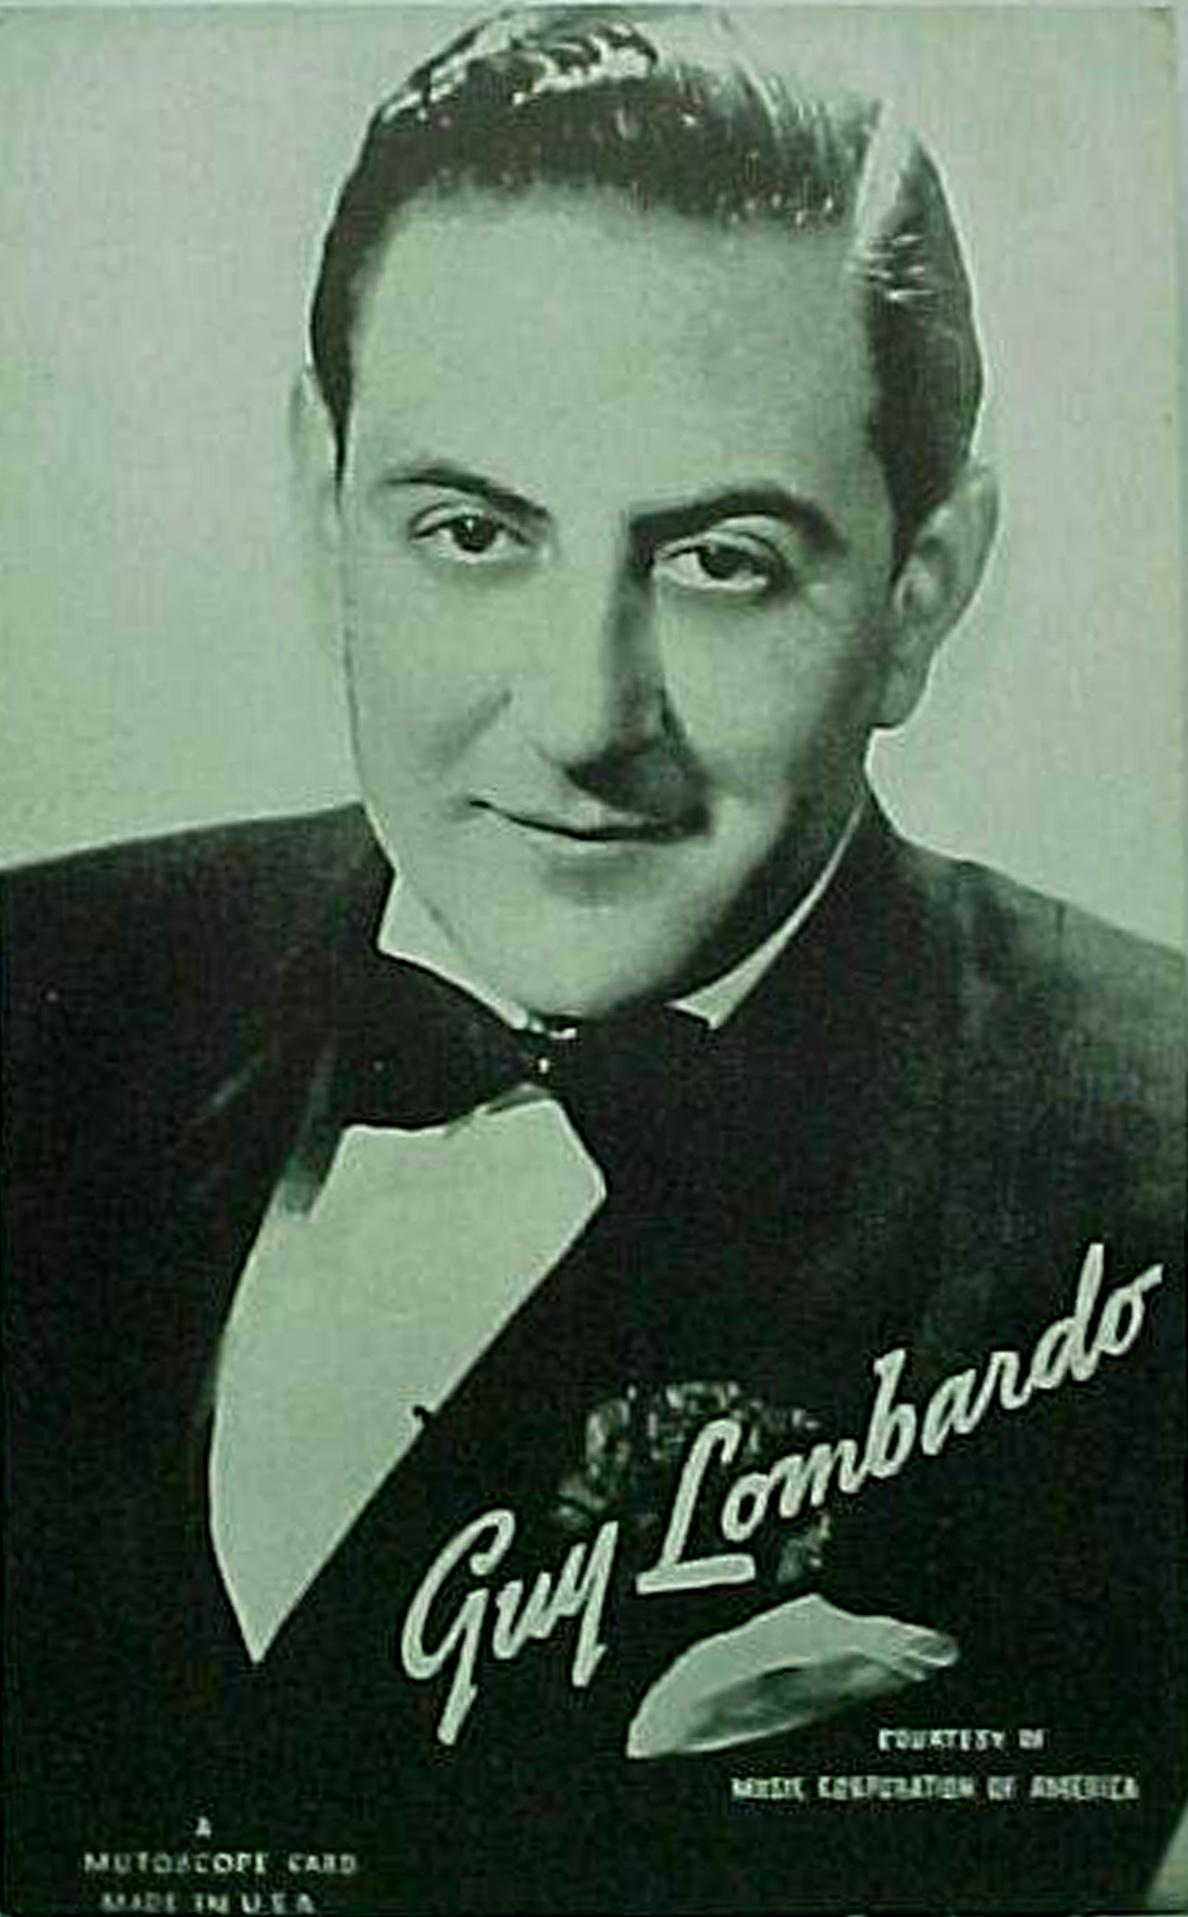 Guylombardo